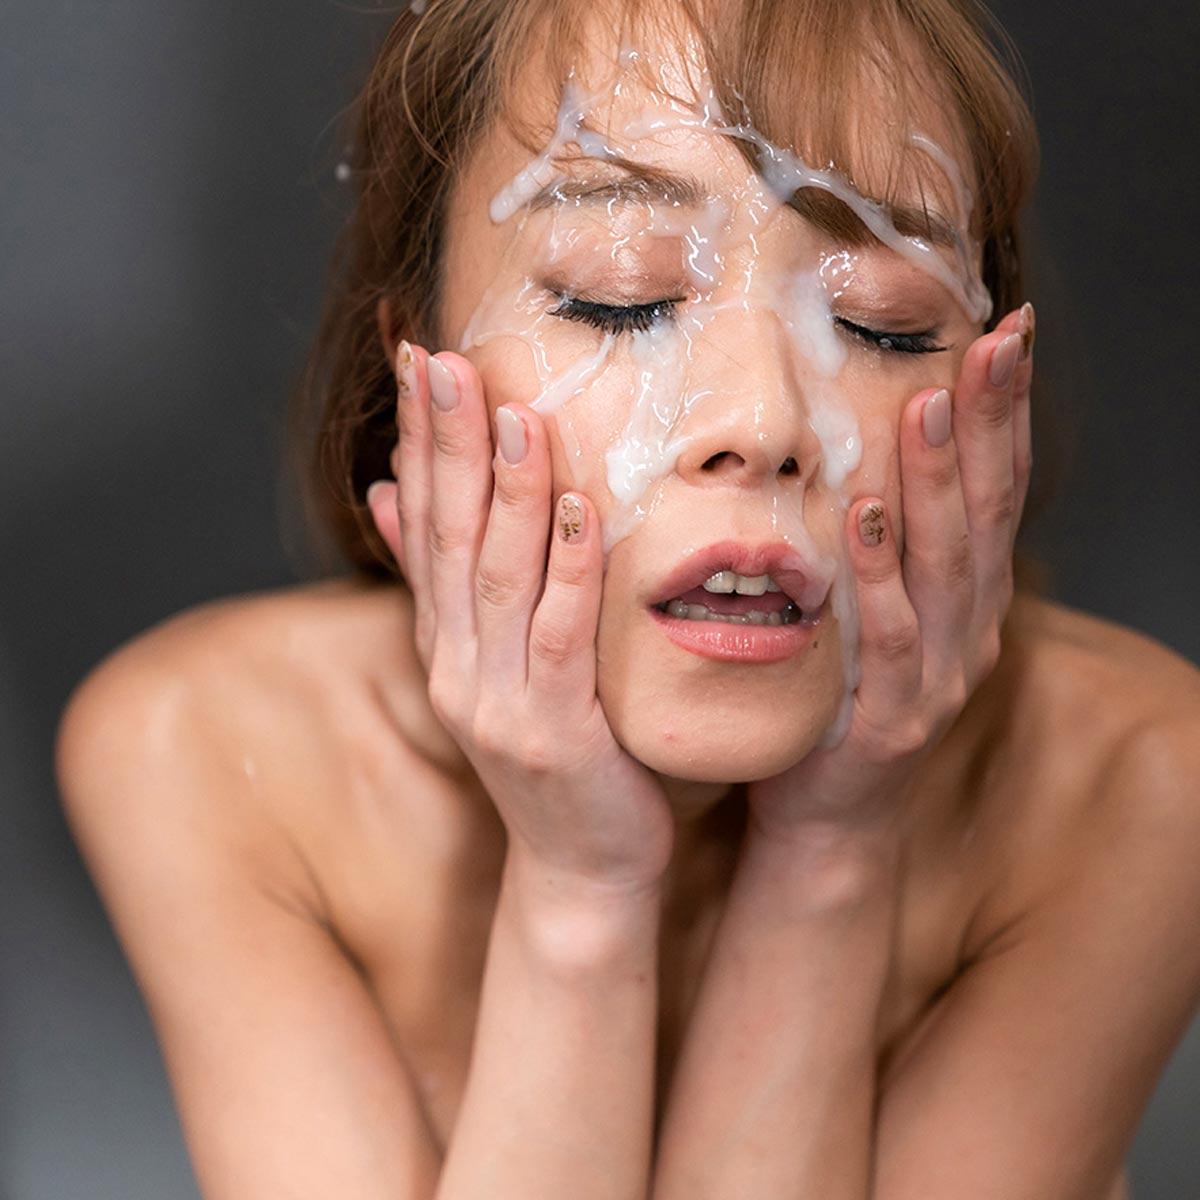 Nanako Nanahara SpermMania video